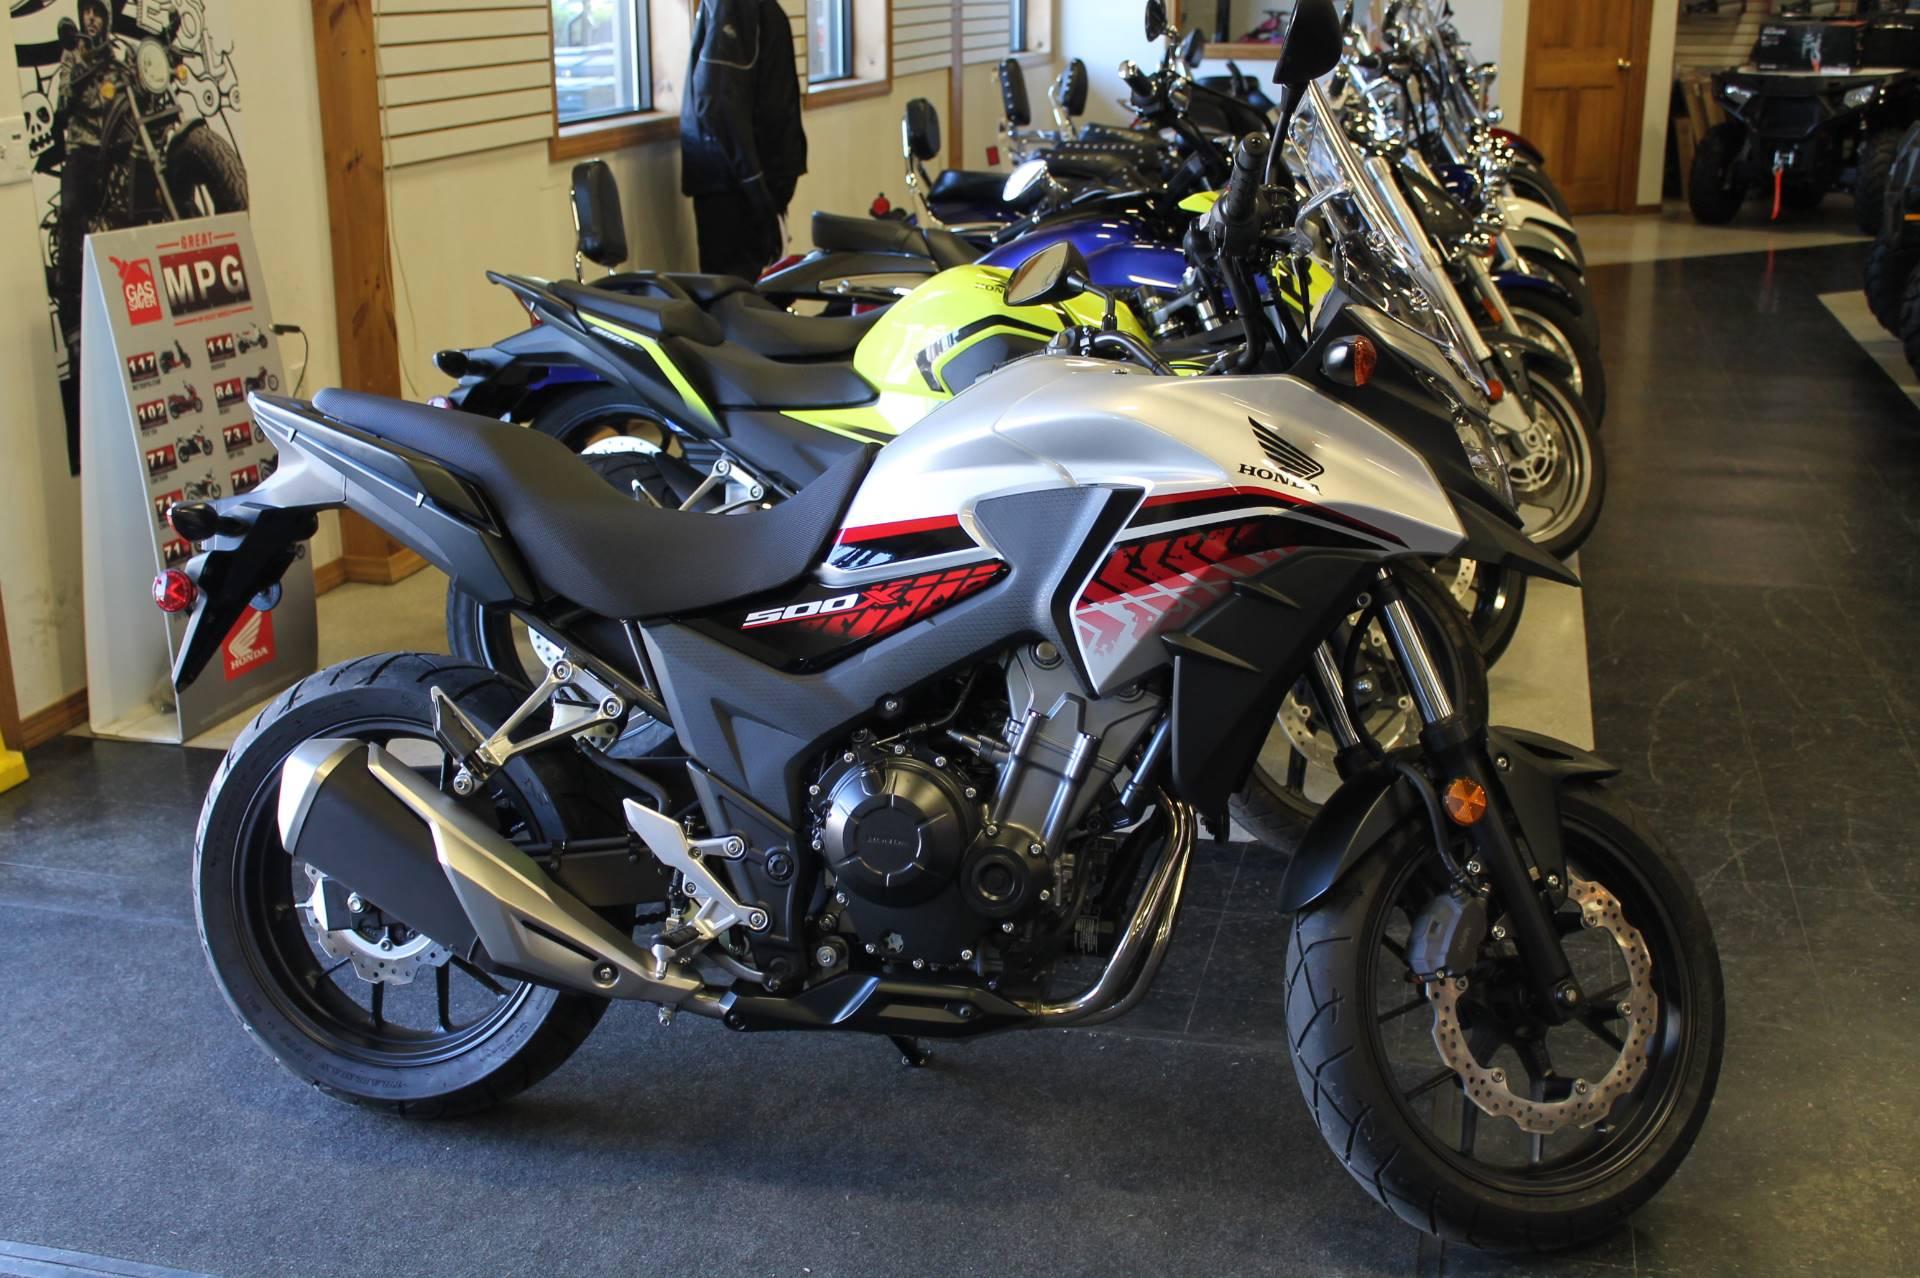 new 2018 honda cb500x motorcycles in adams ma stock. Black Bedroom Furniture Sets. Home Design Ideas